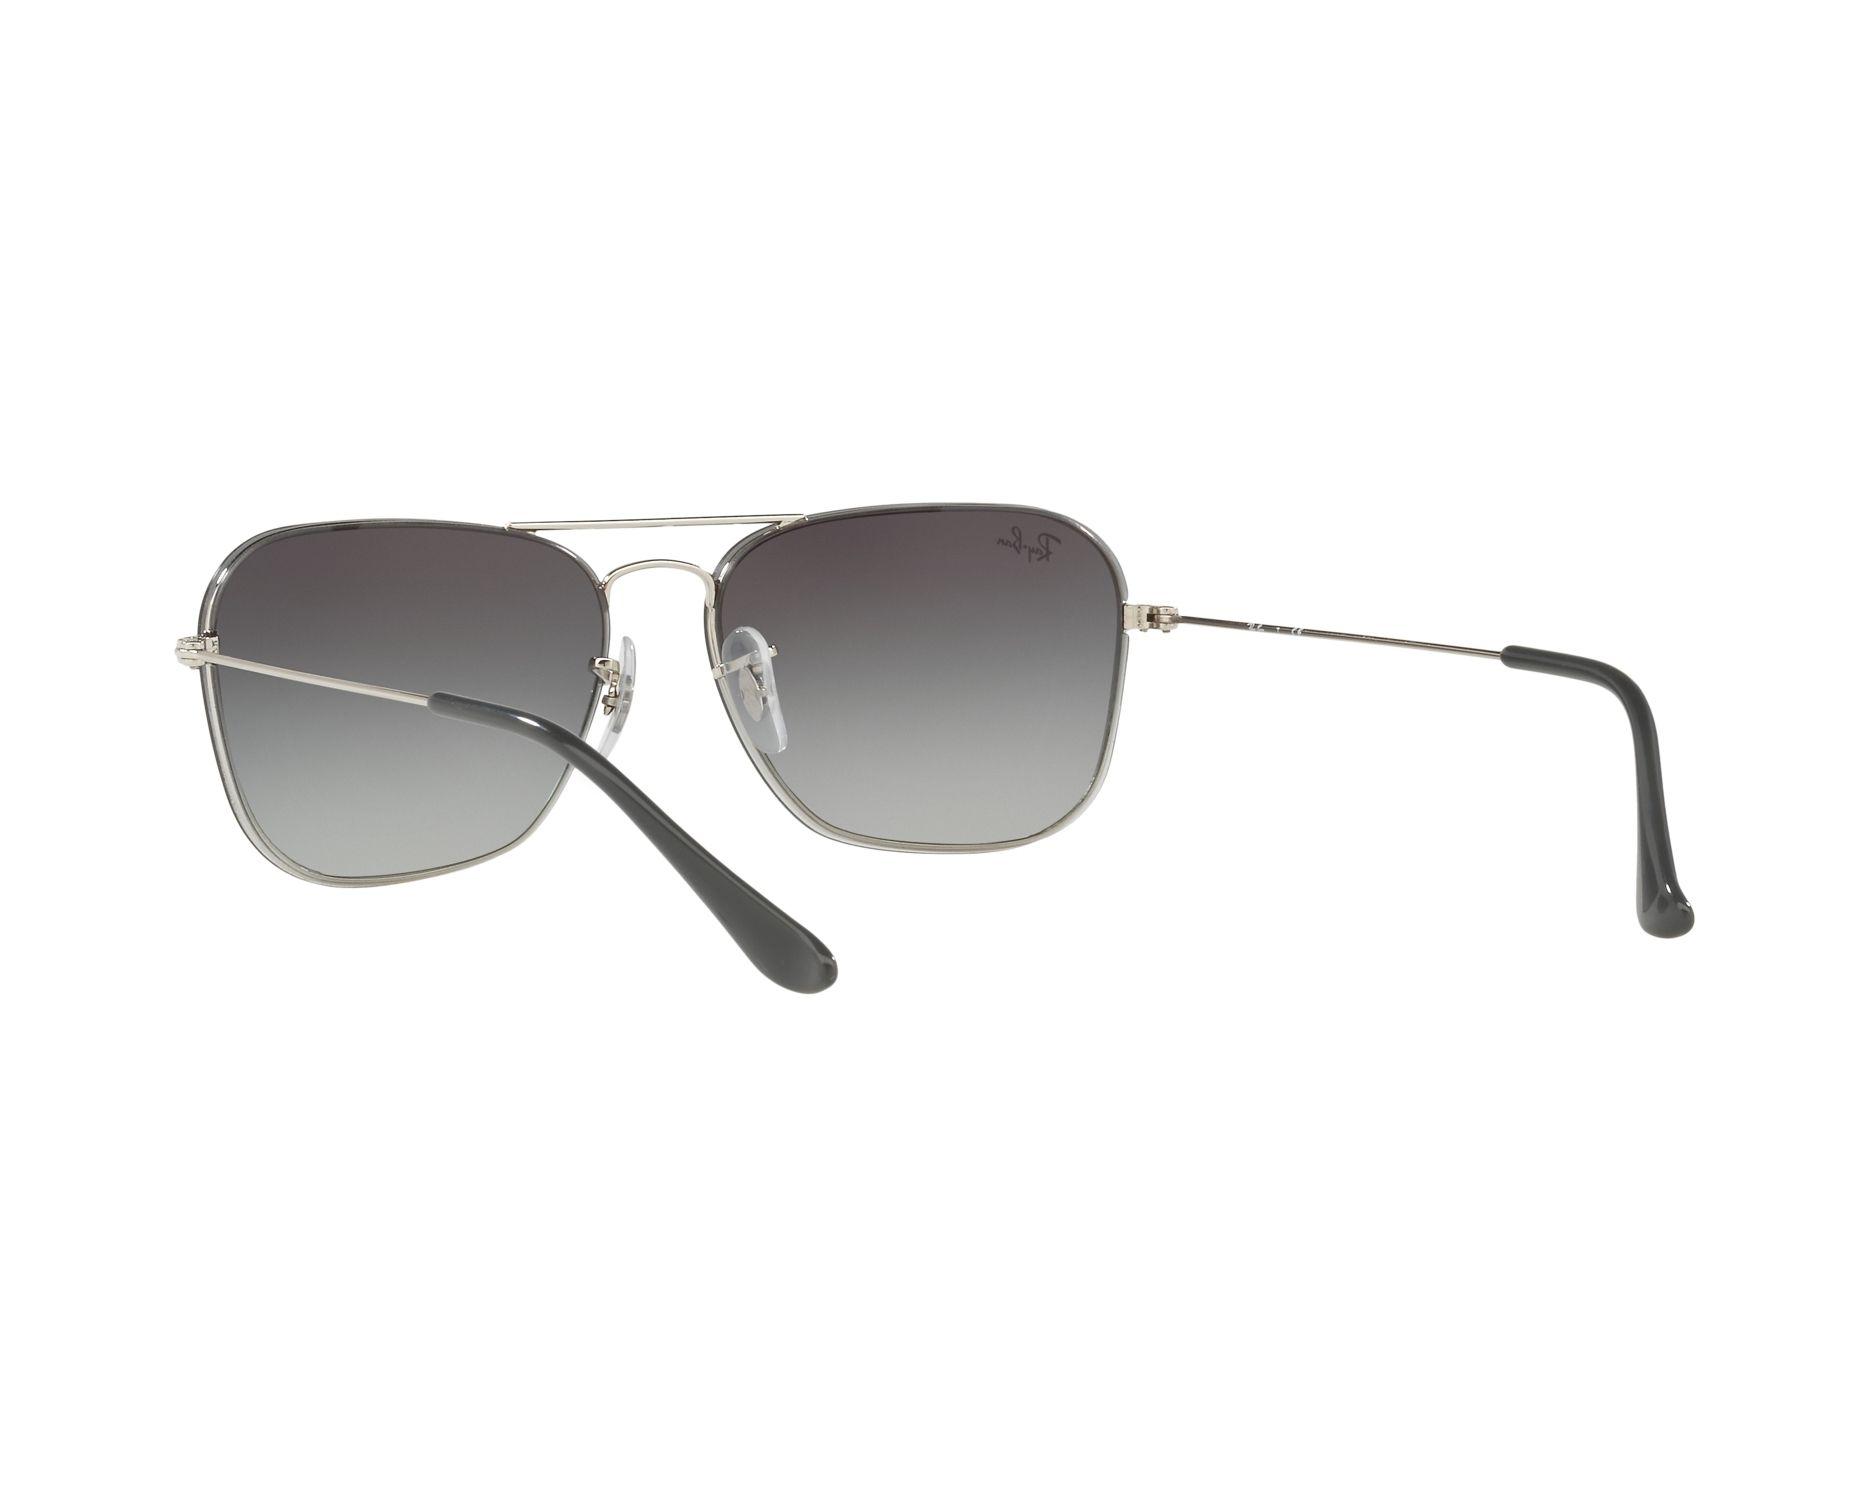 863c9d7a23 Sunglasses Ray-Ban RB-3603 003 U0 56-14 Silver 360 degree